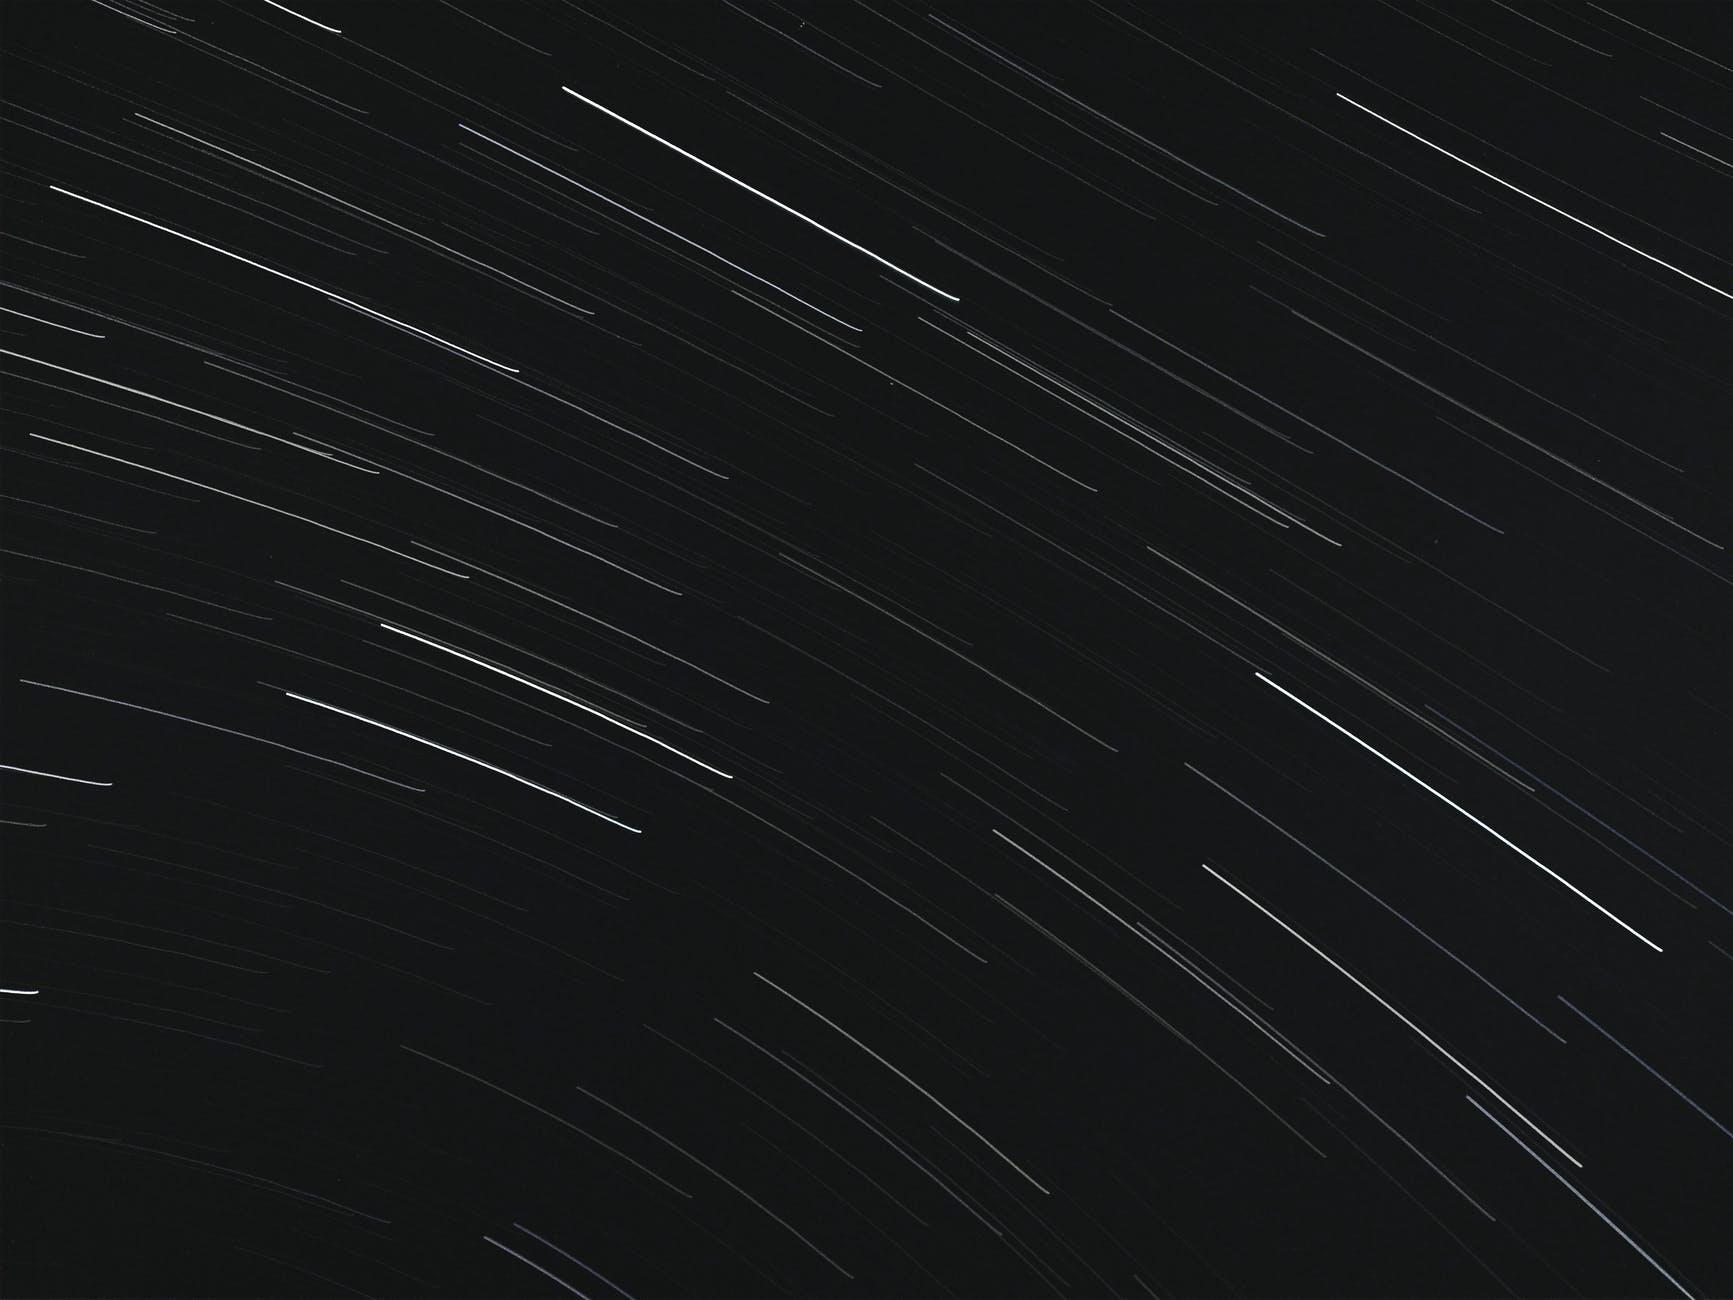 dark night sky with bright stars